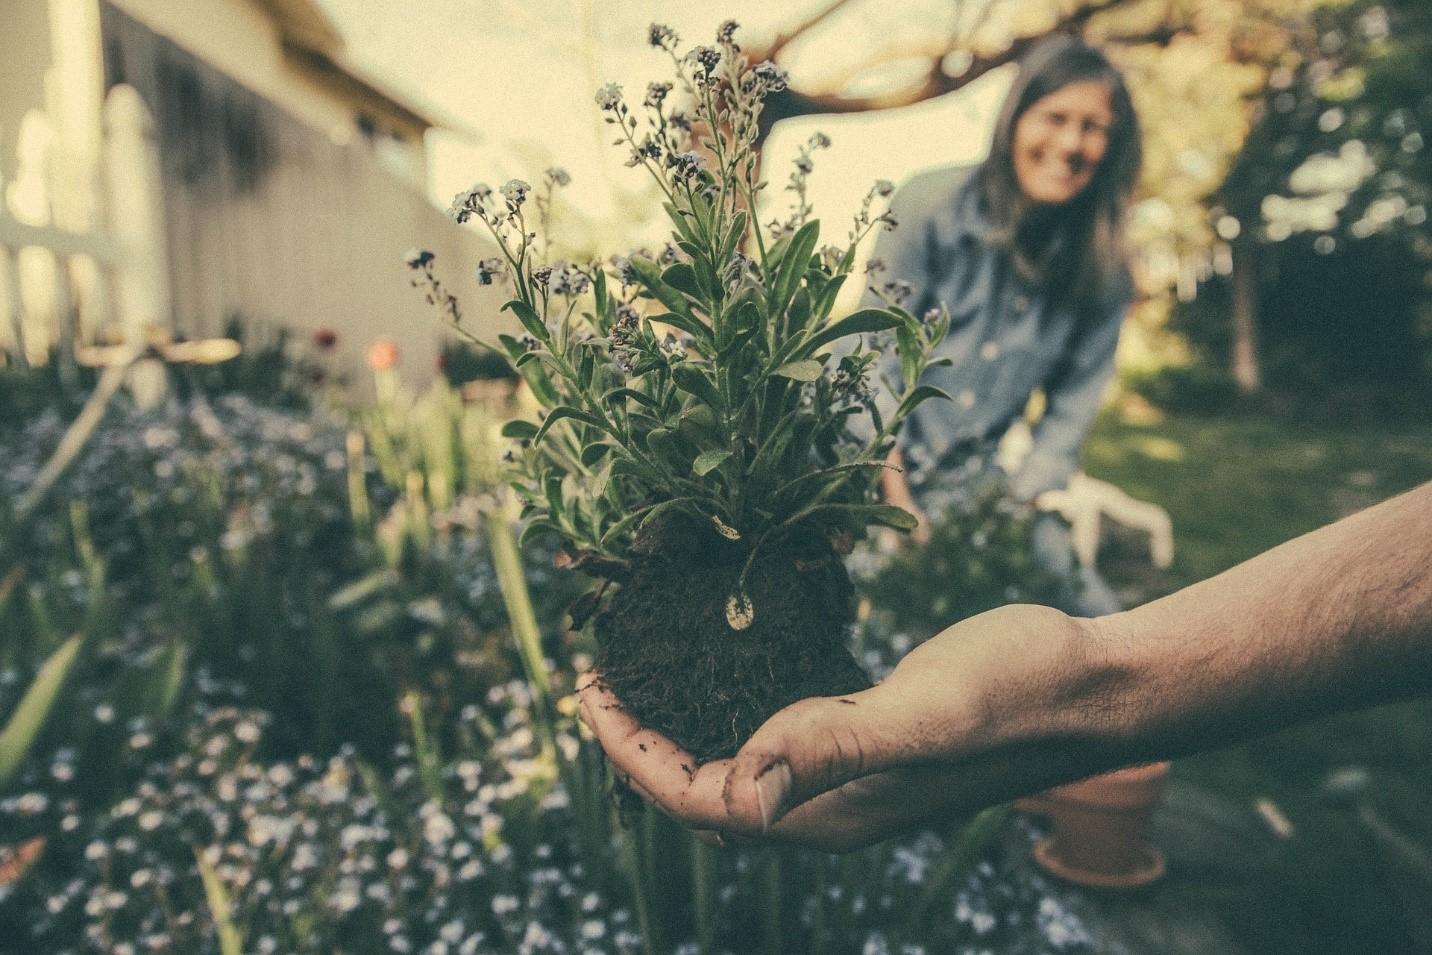 Spring 2020 Helpful Gardening Tips